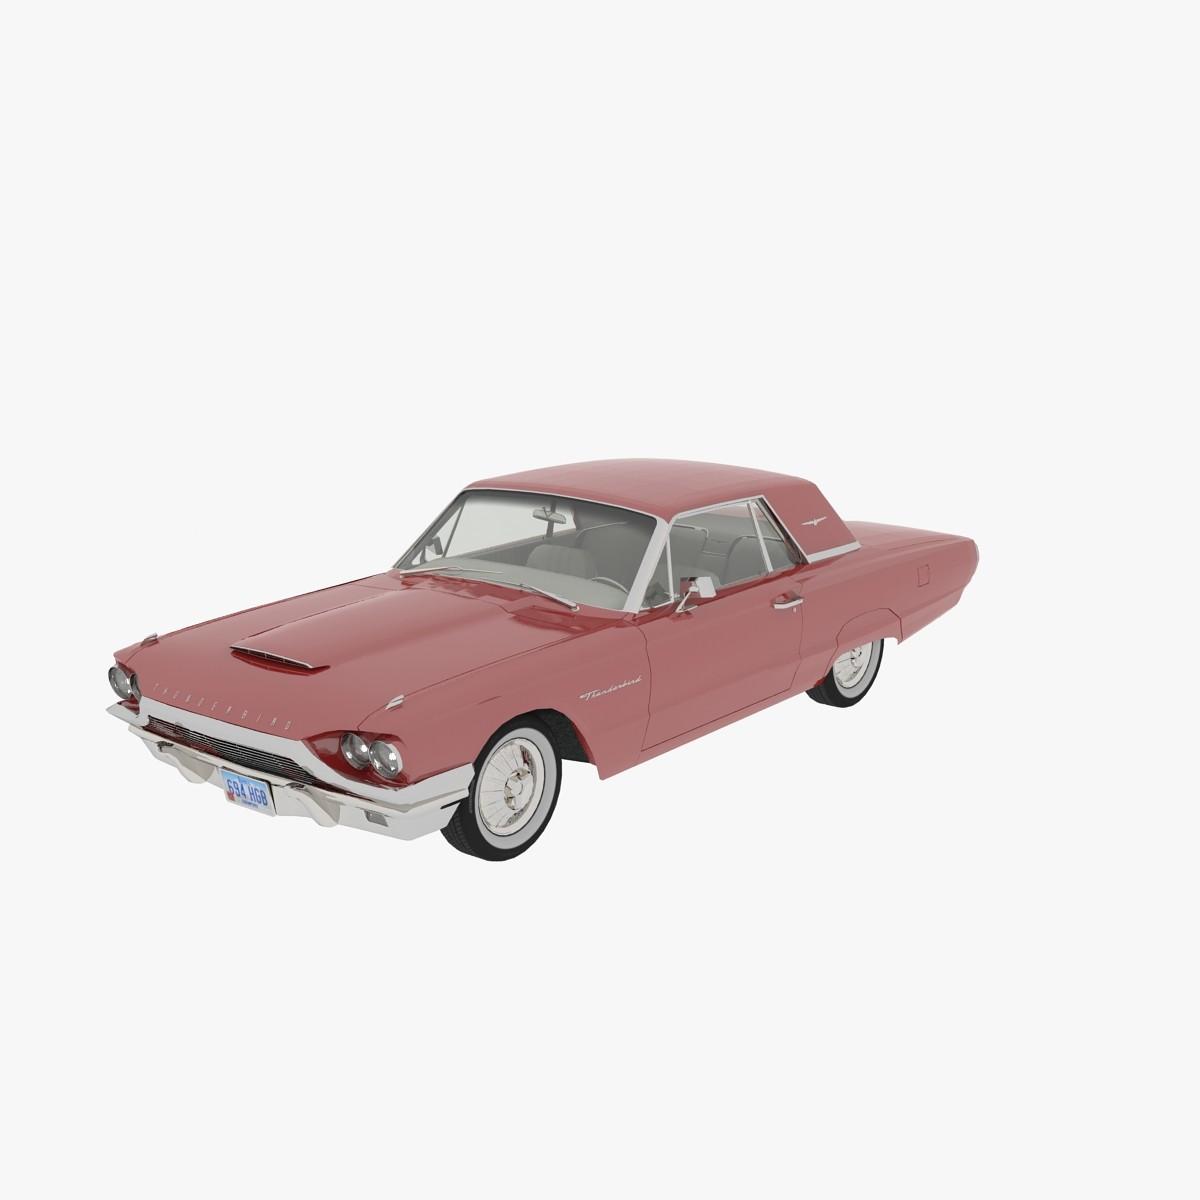 Ford_thunderbird_1964_Camera001_Thumbnail_1.JPG